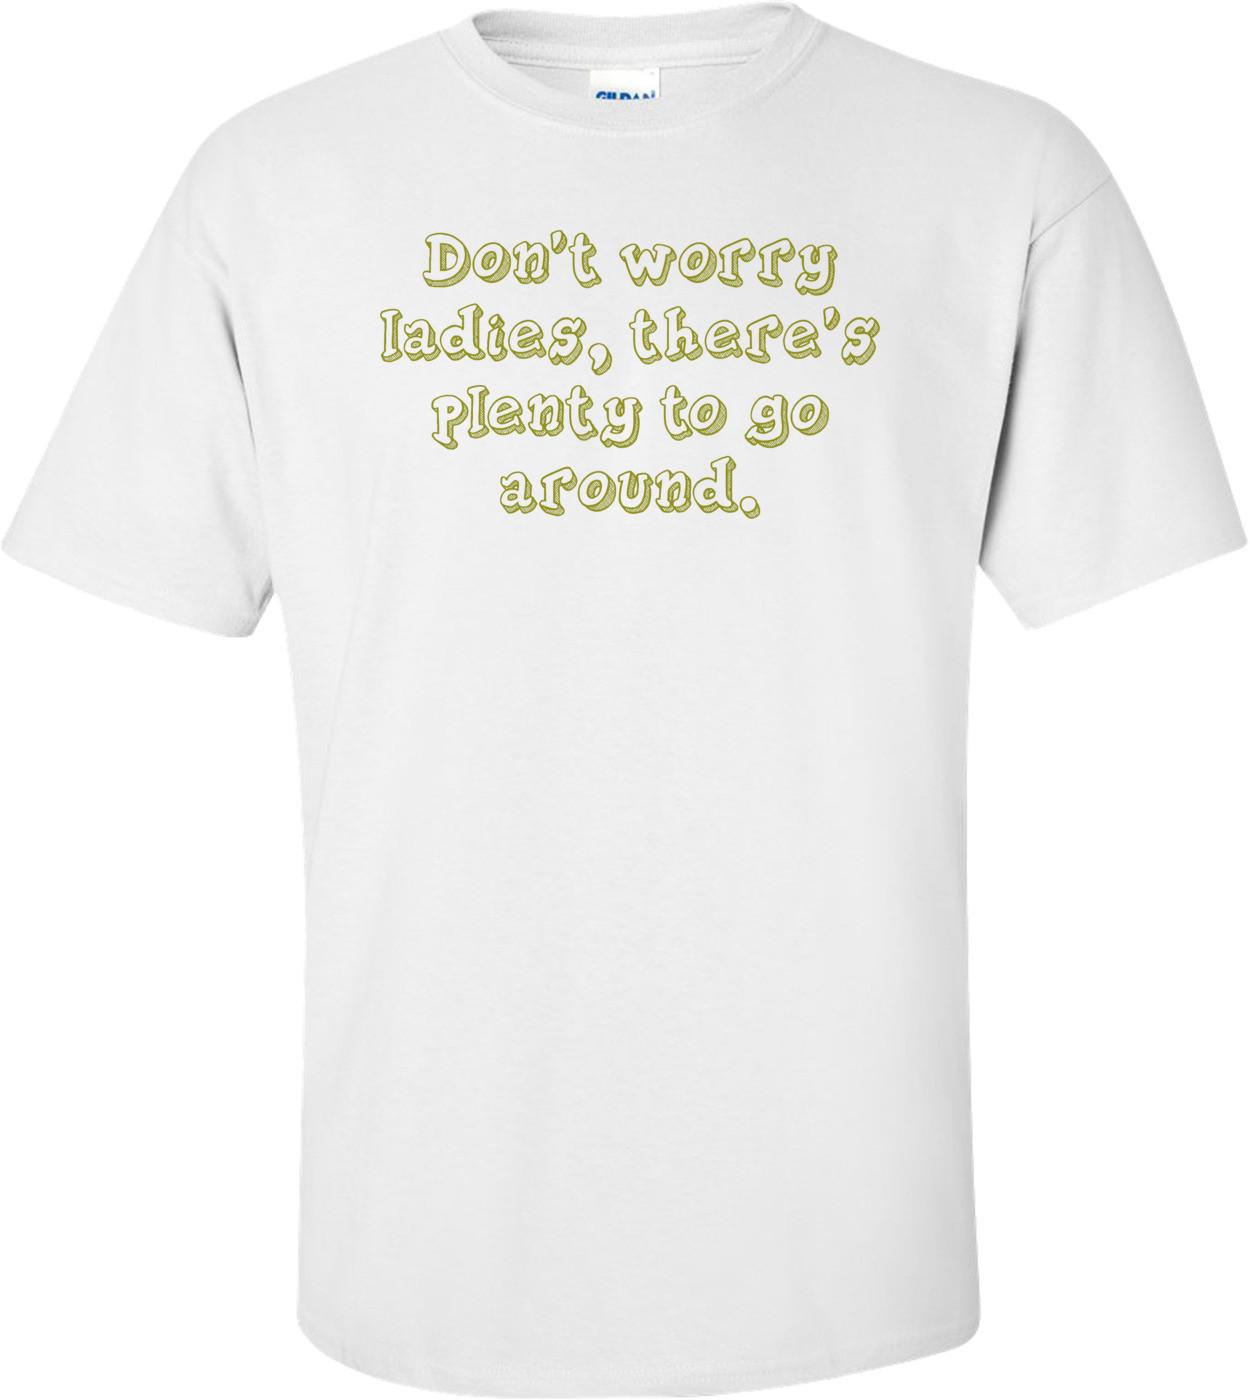 Don't worry ladies, there's plenty to go around. Shirt